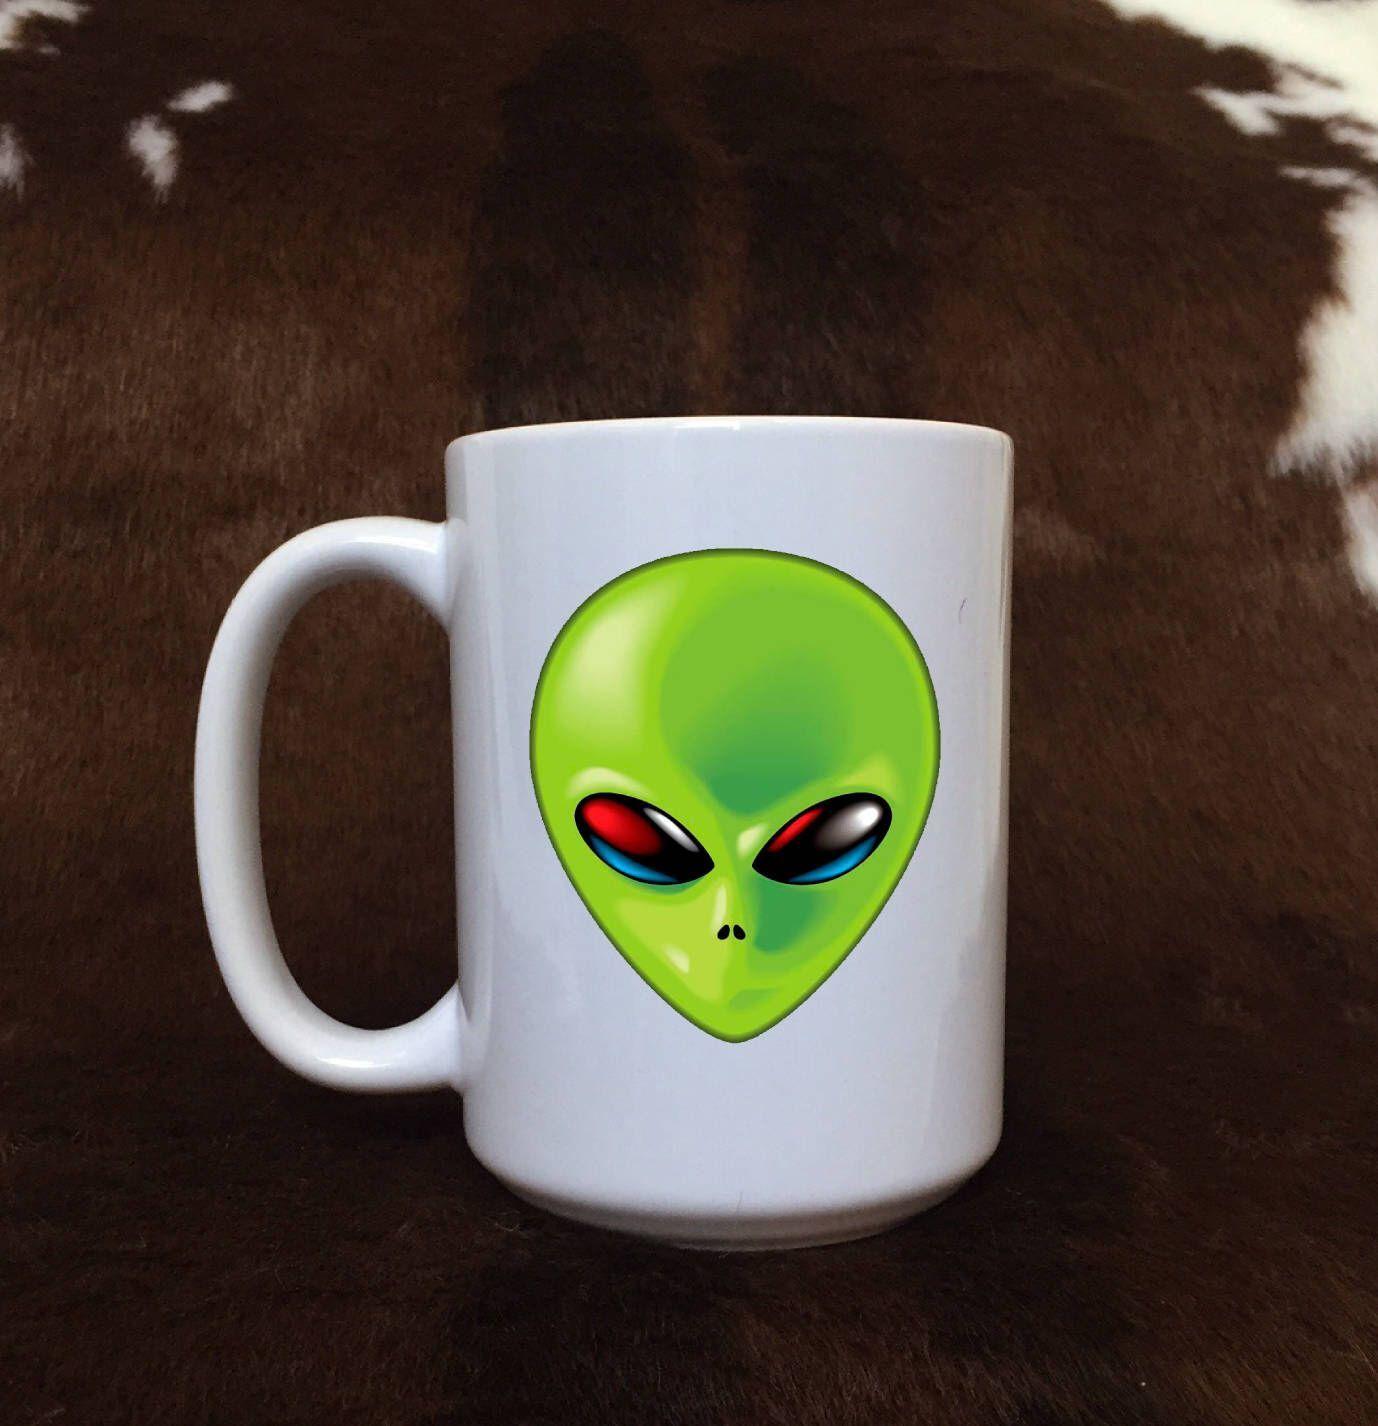 Alien mug, monster coffee mug, green alien, coffee lovers